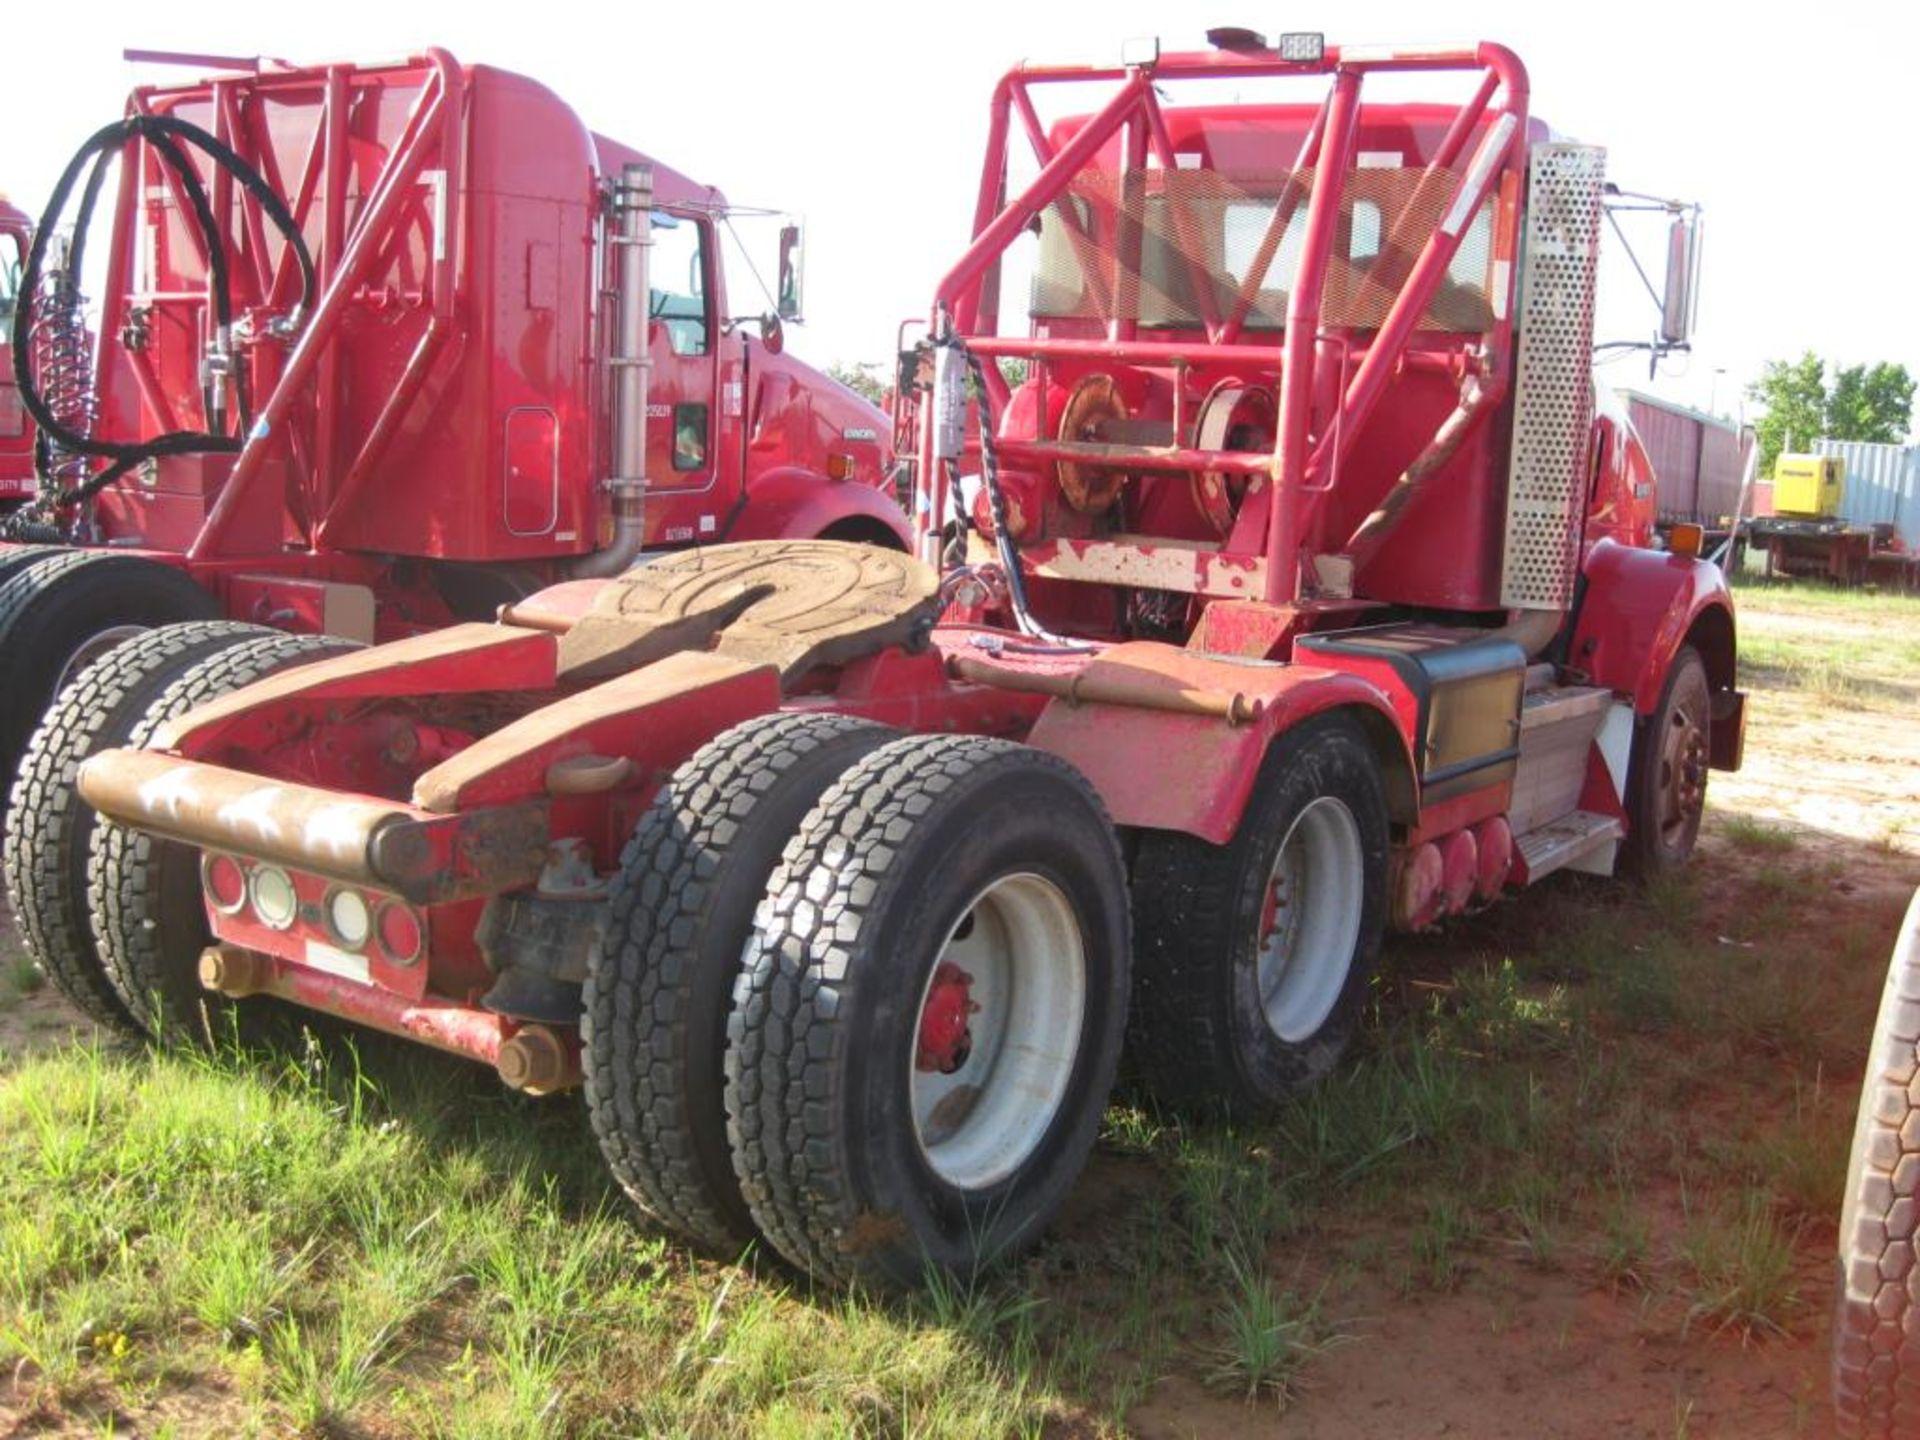 Kenworth Winch Truck - Image 5 of 22